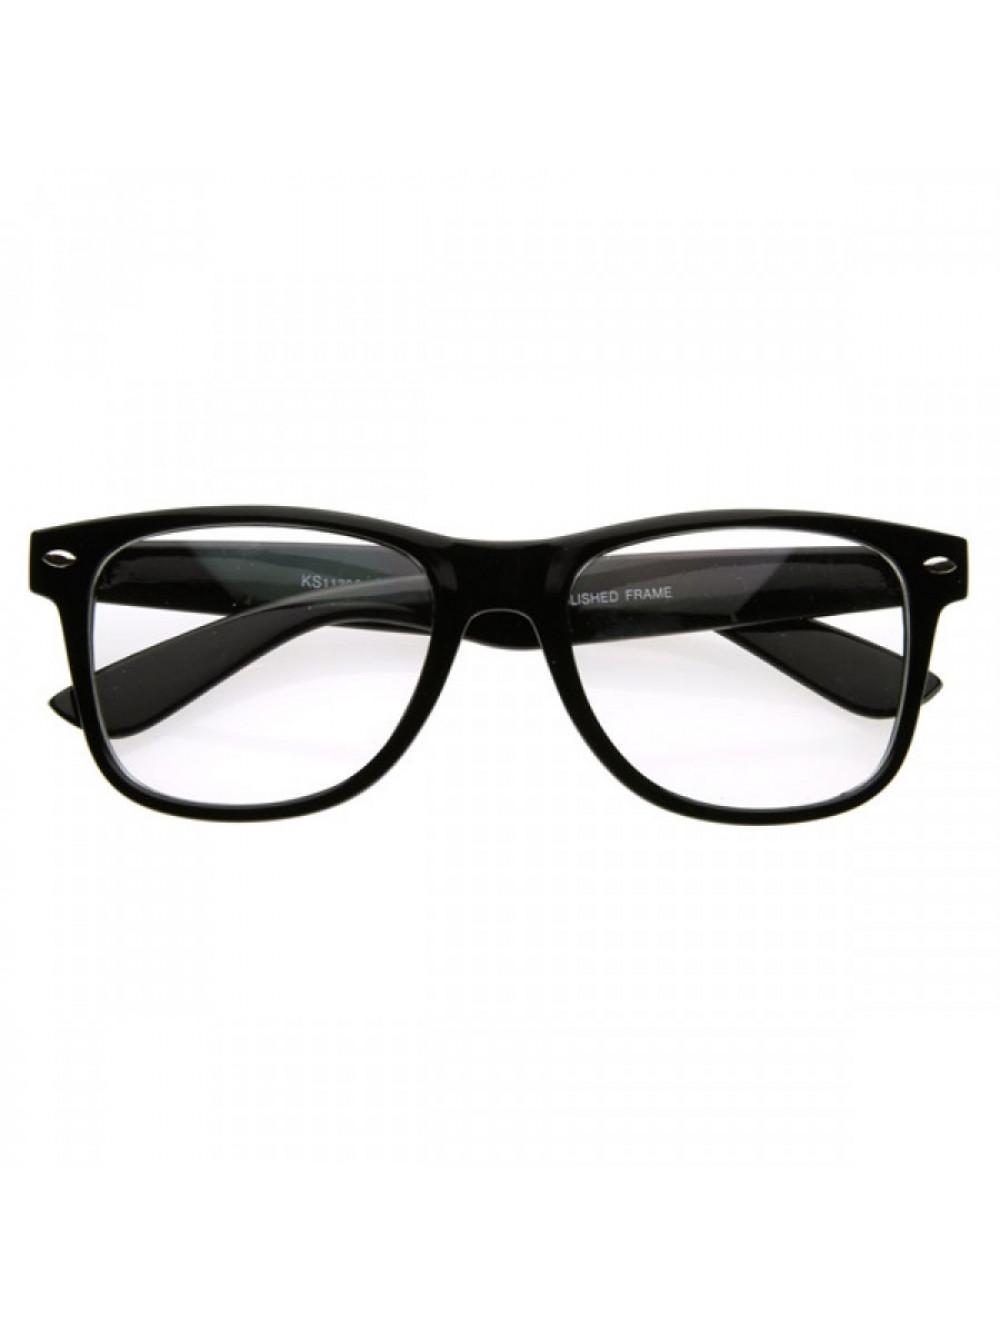 71bd71889 Brýle Wayfarer Black Nerd; Brýle Wayfarer Black Nerd